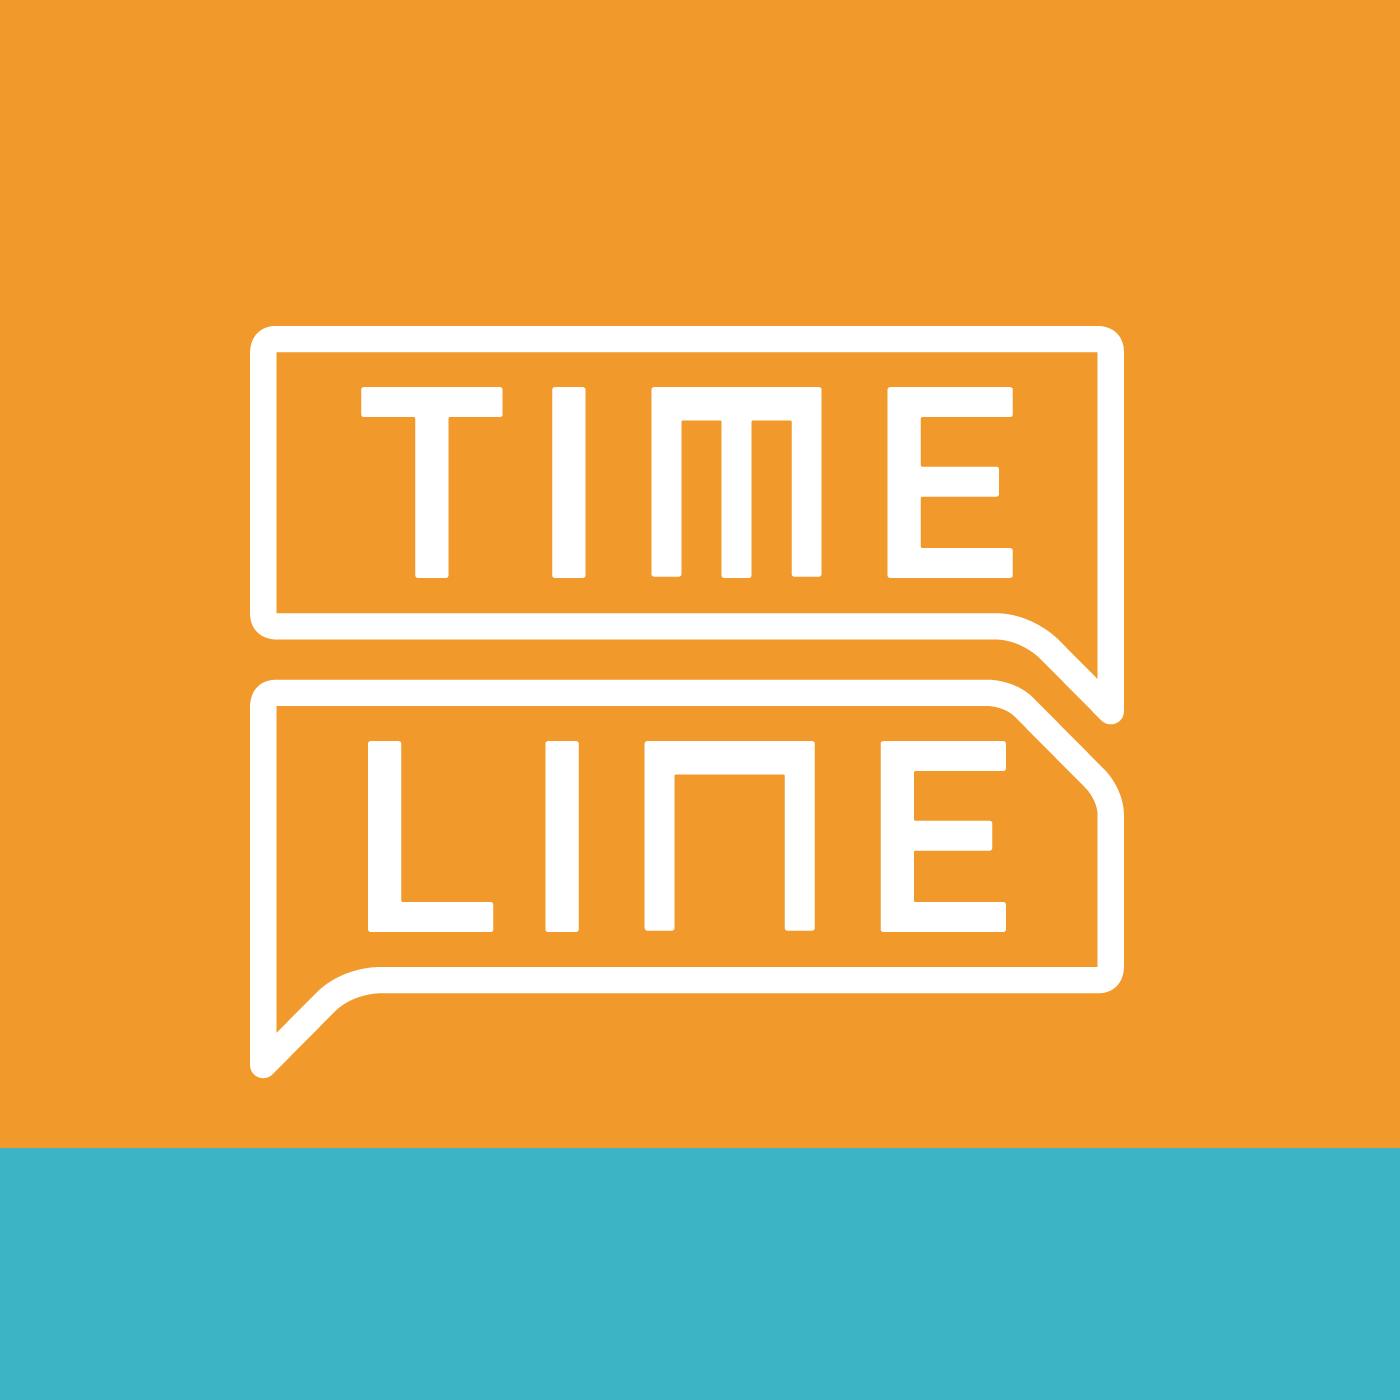 Timeline Ga�cha - 24/10/2016